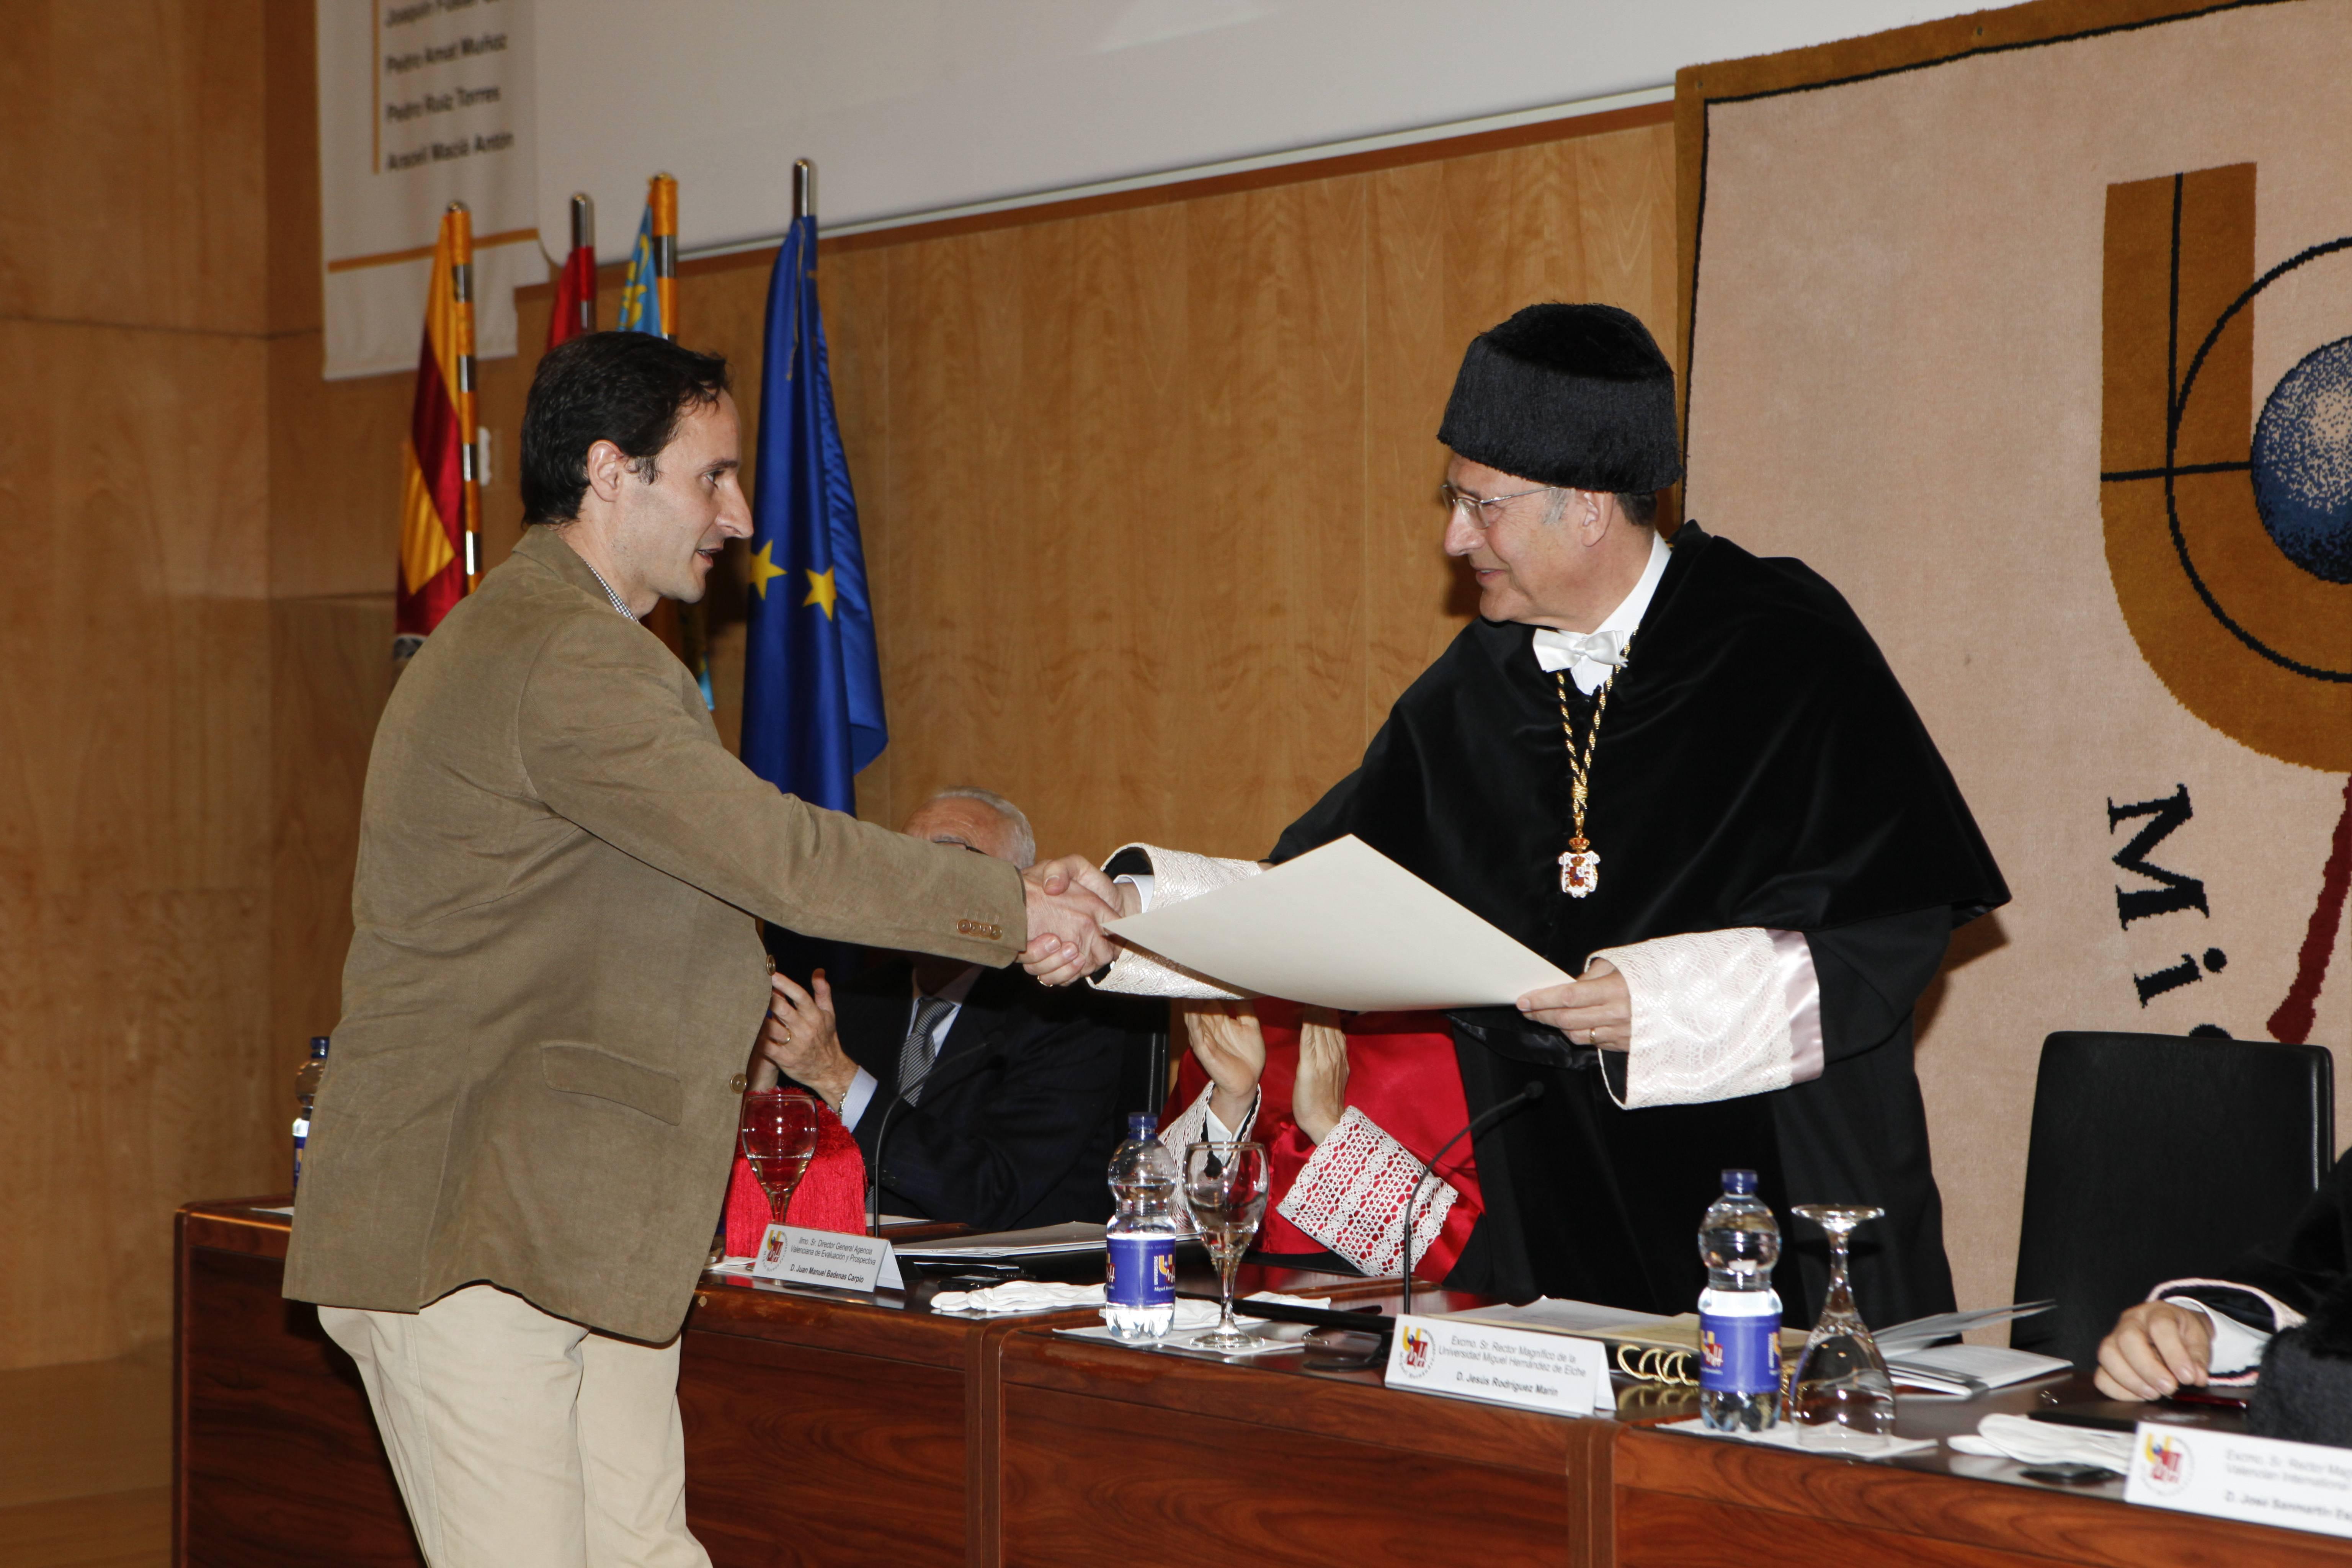 doctor-honoris-causa-luis-gamir_mg_1055.jpg